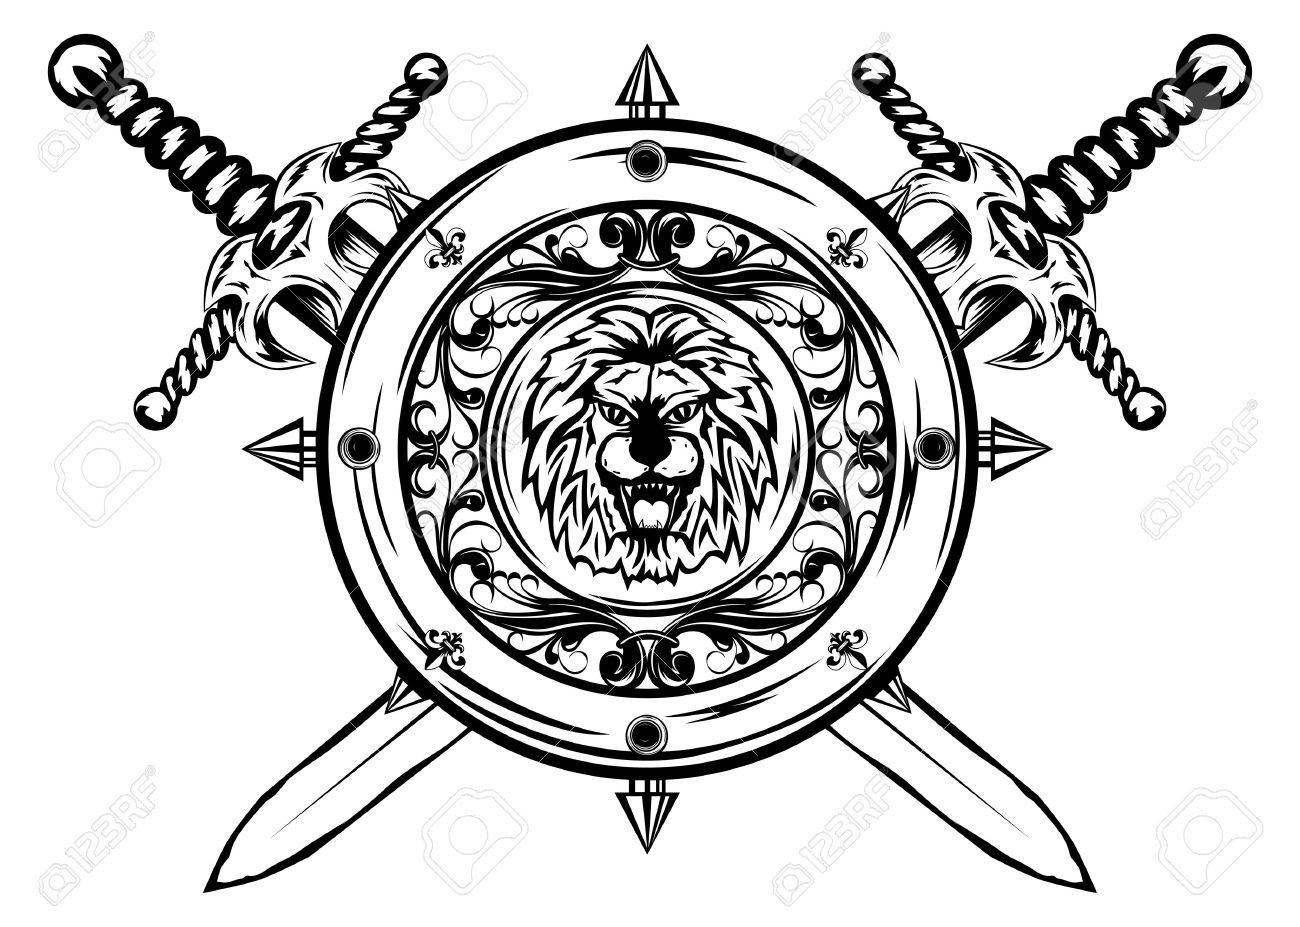 Sword dezine clipart line drawing clip art free library Stock Vector | Tattoo | Sword tattoo, Shield tattoo, Sword clip art free library